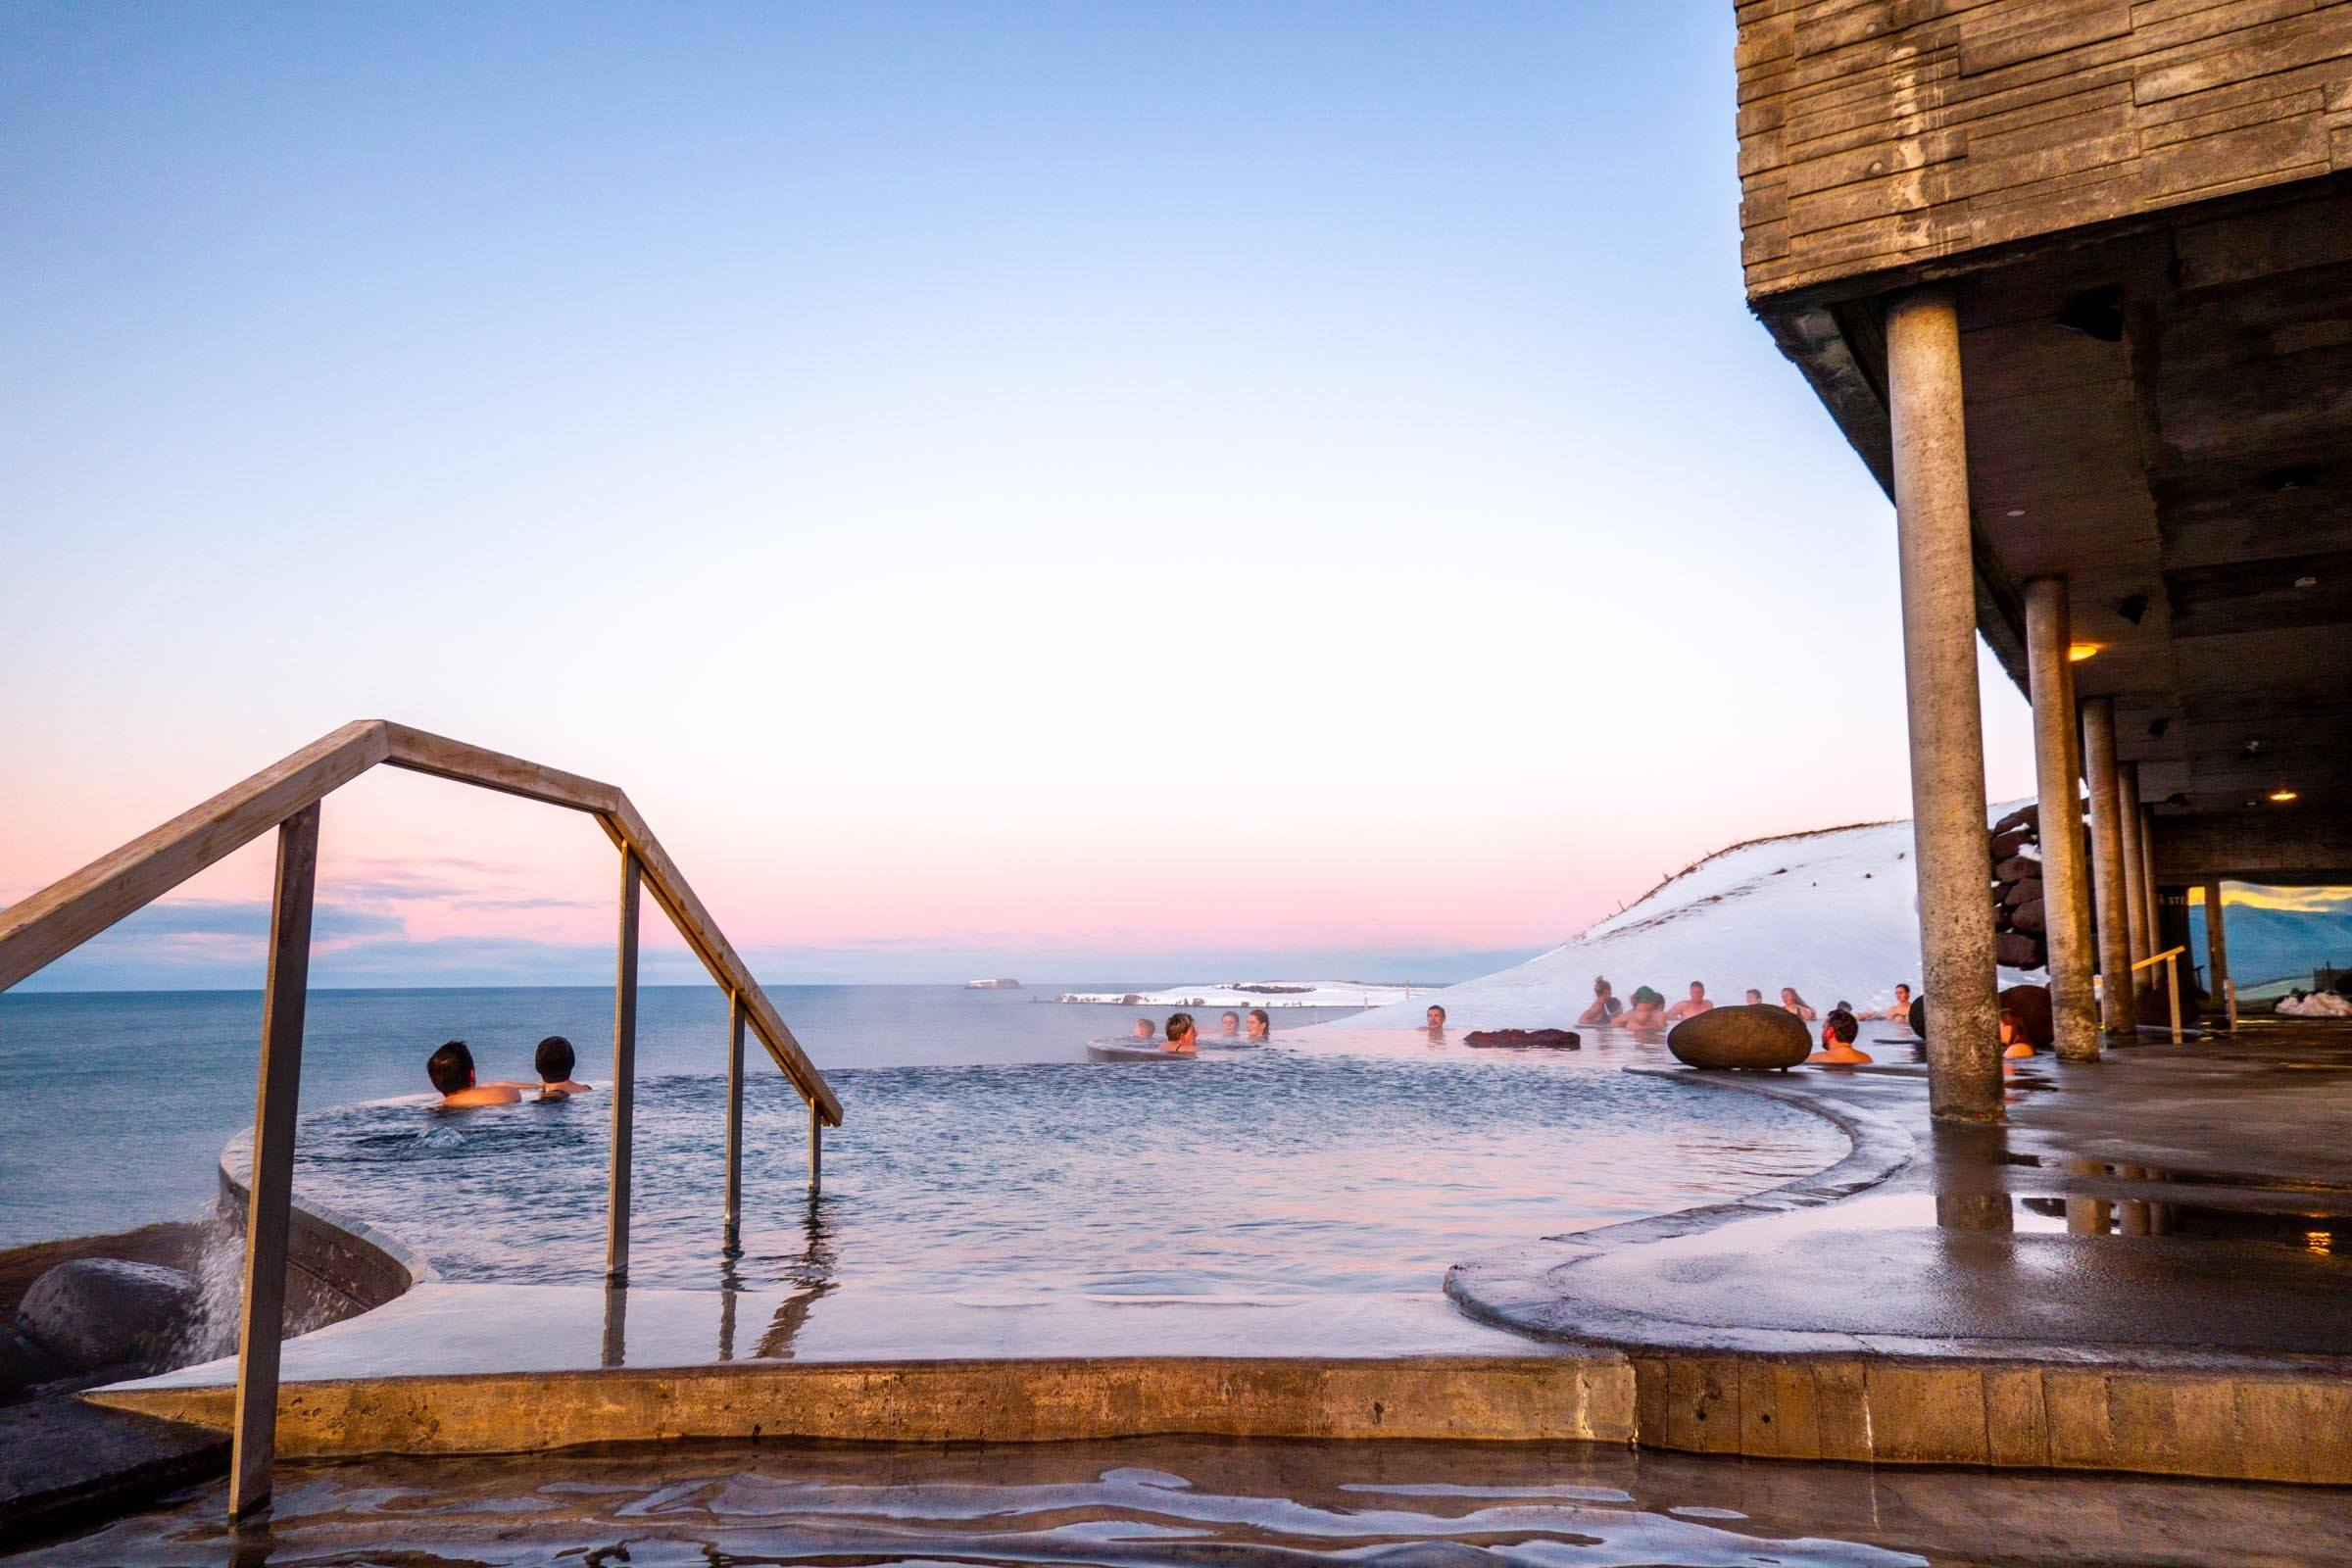 GeoSea Geothermal Baths in the winter